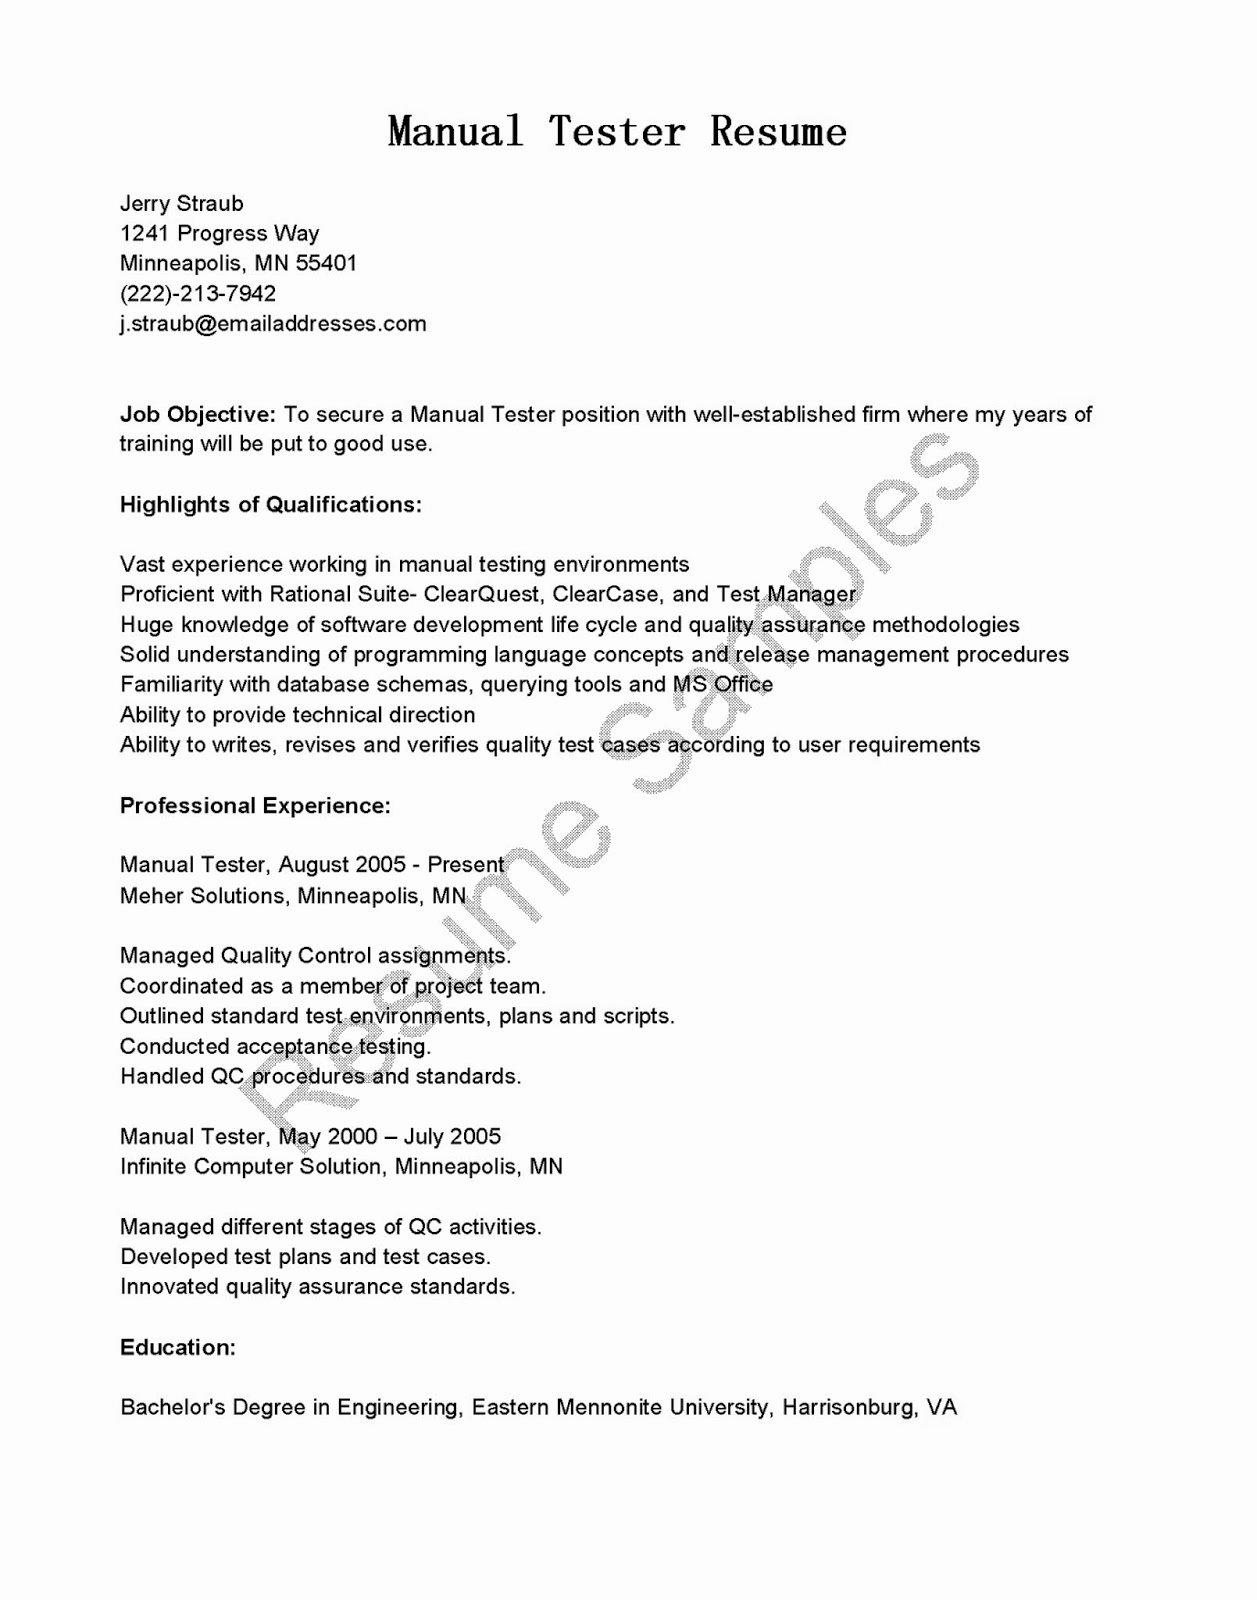 Resume Samples Manual Tester Resume Sample